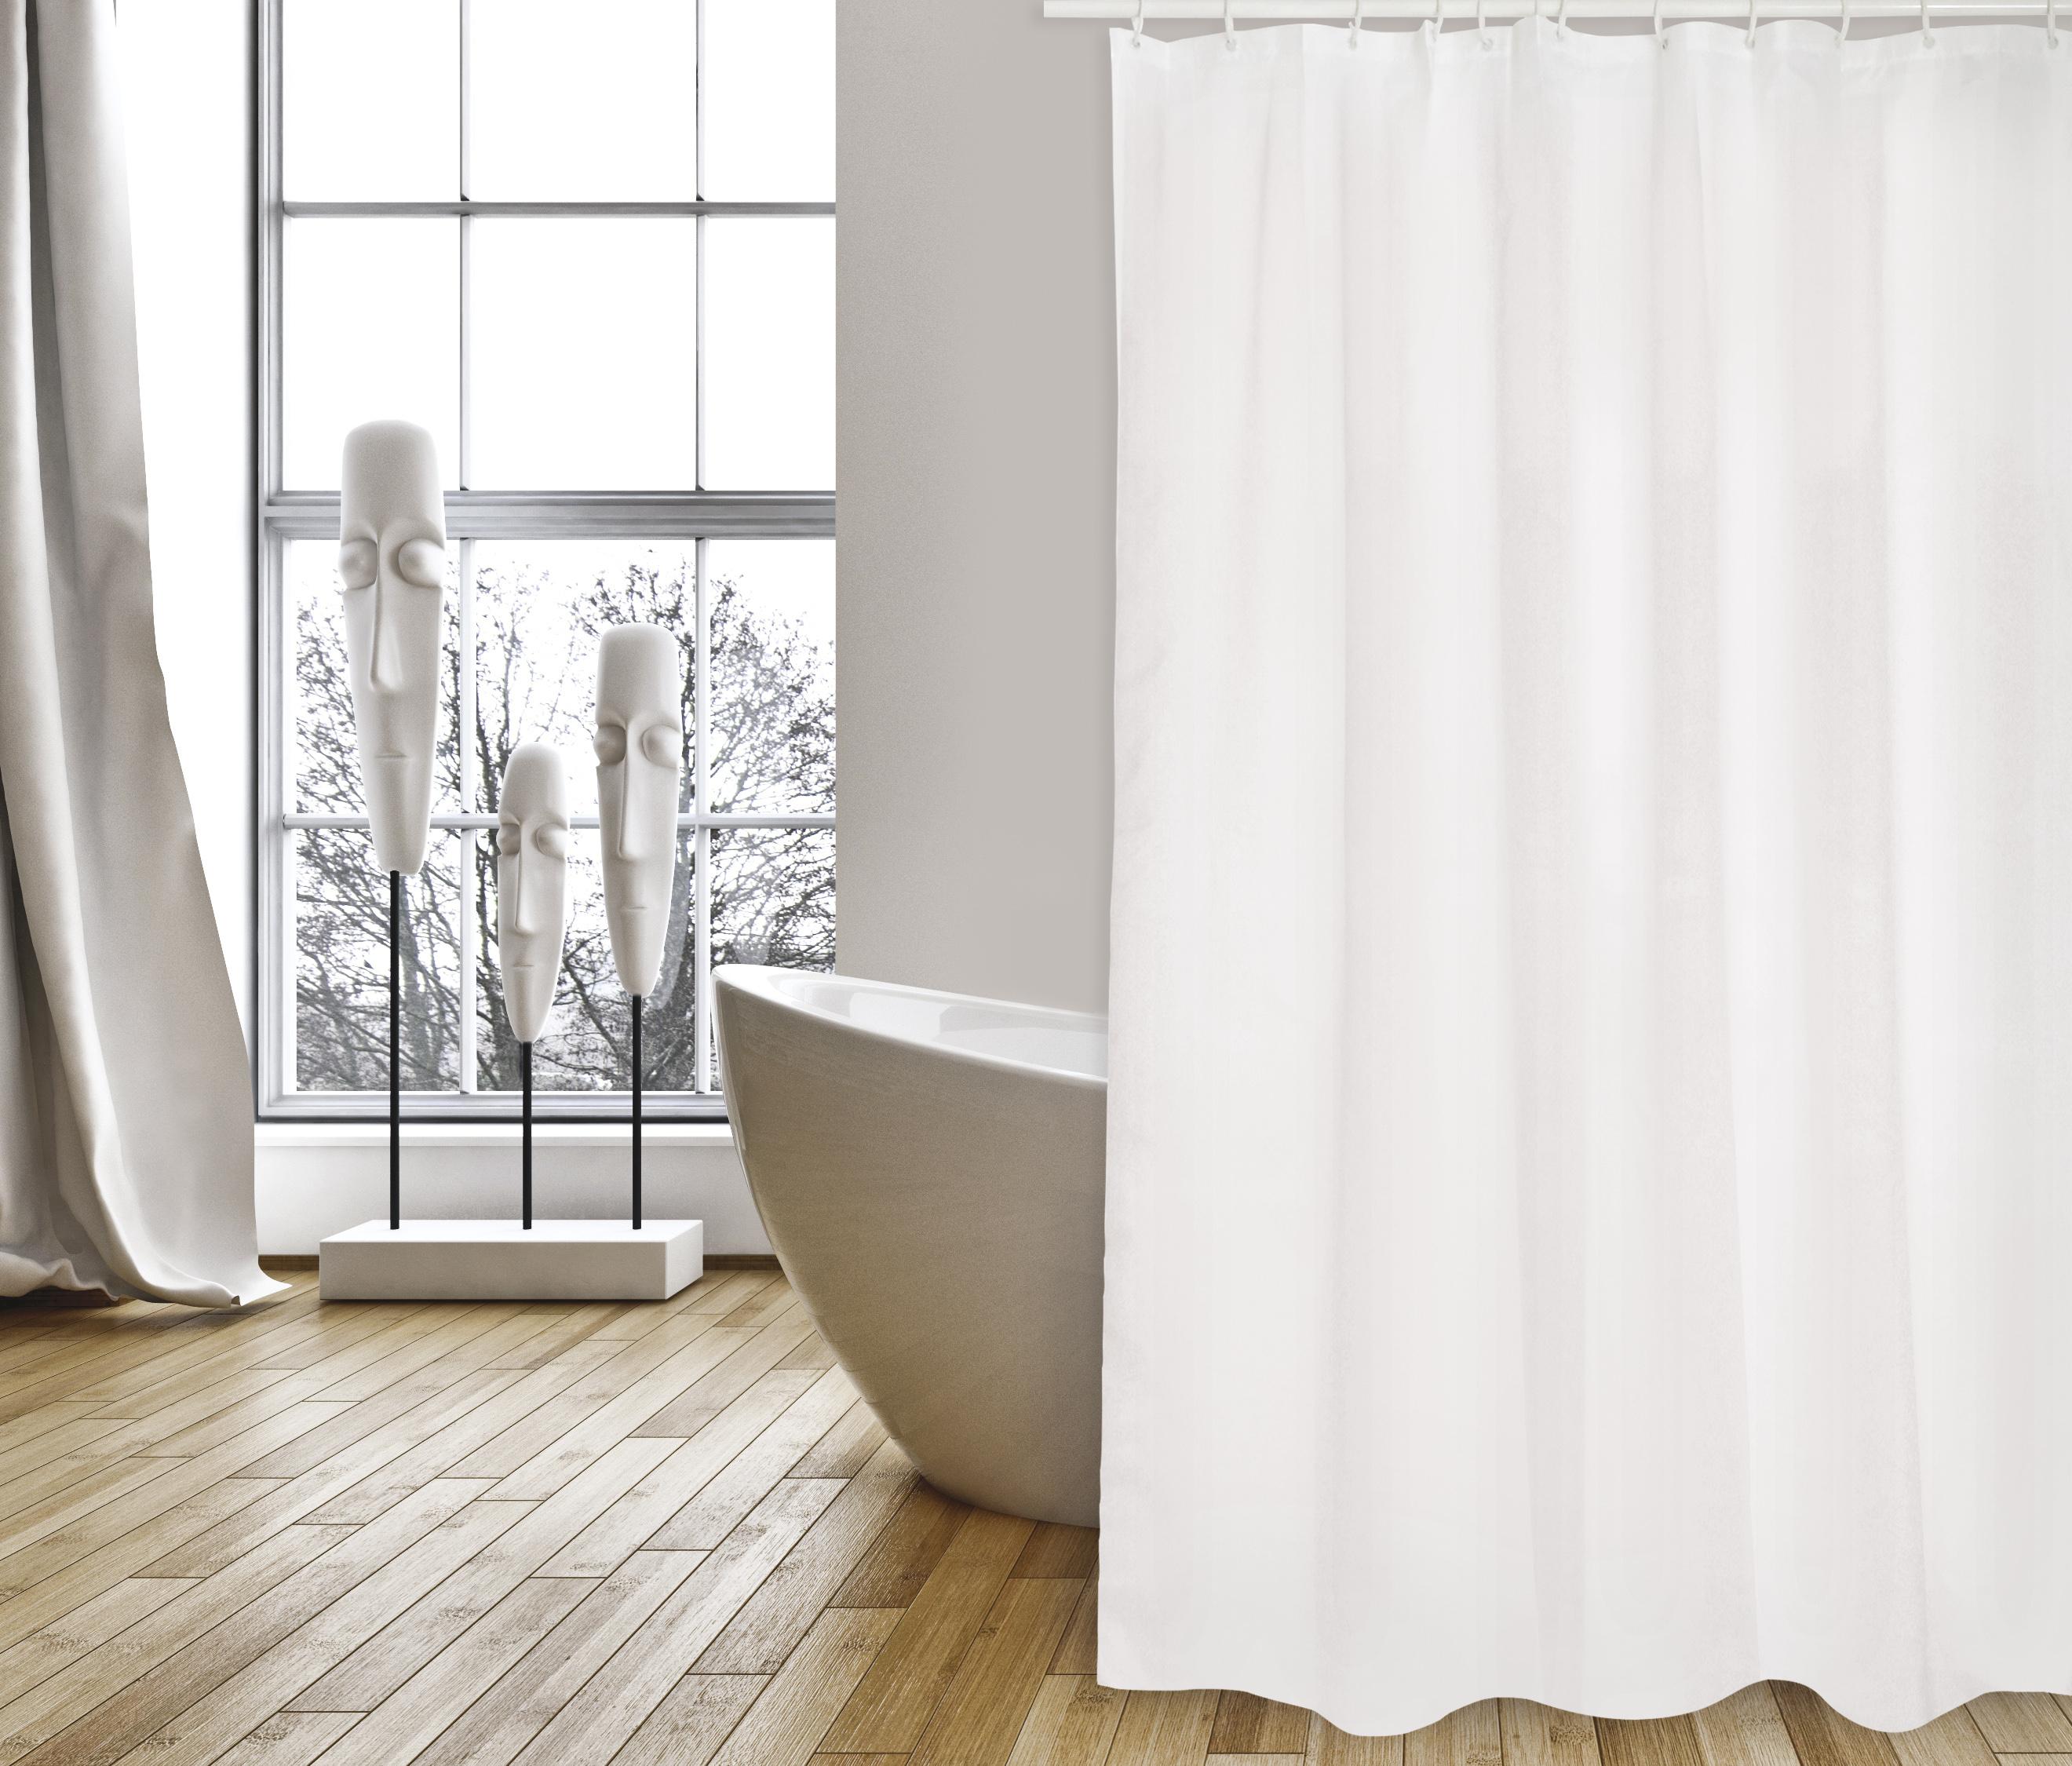 MSV Duschvorhang 180x200cm Anti Schimmel Textil Badewannenvorhang Wannenvorhang Weiss Uni